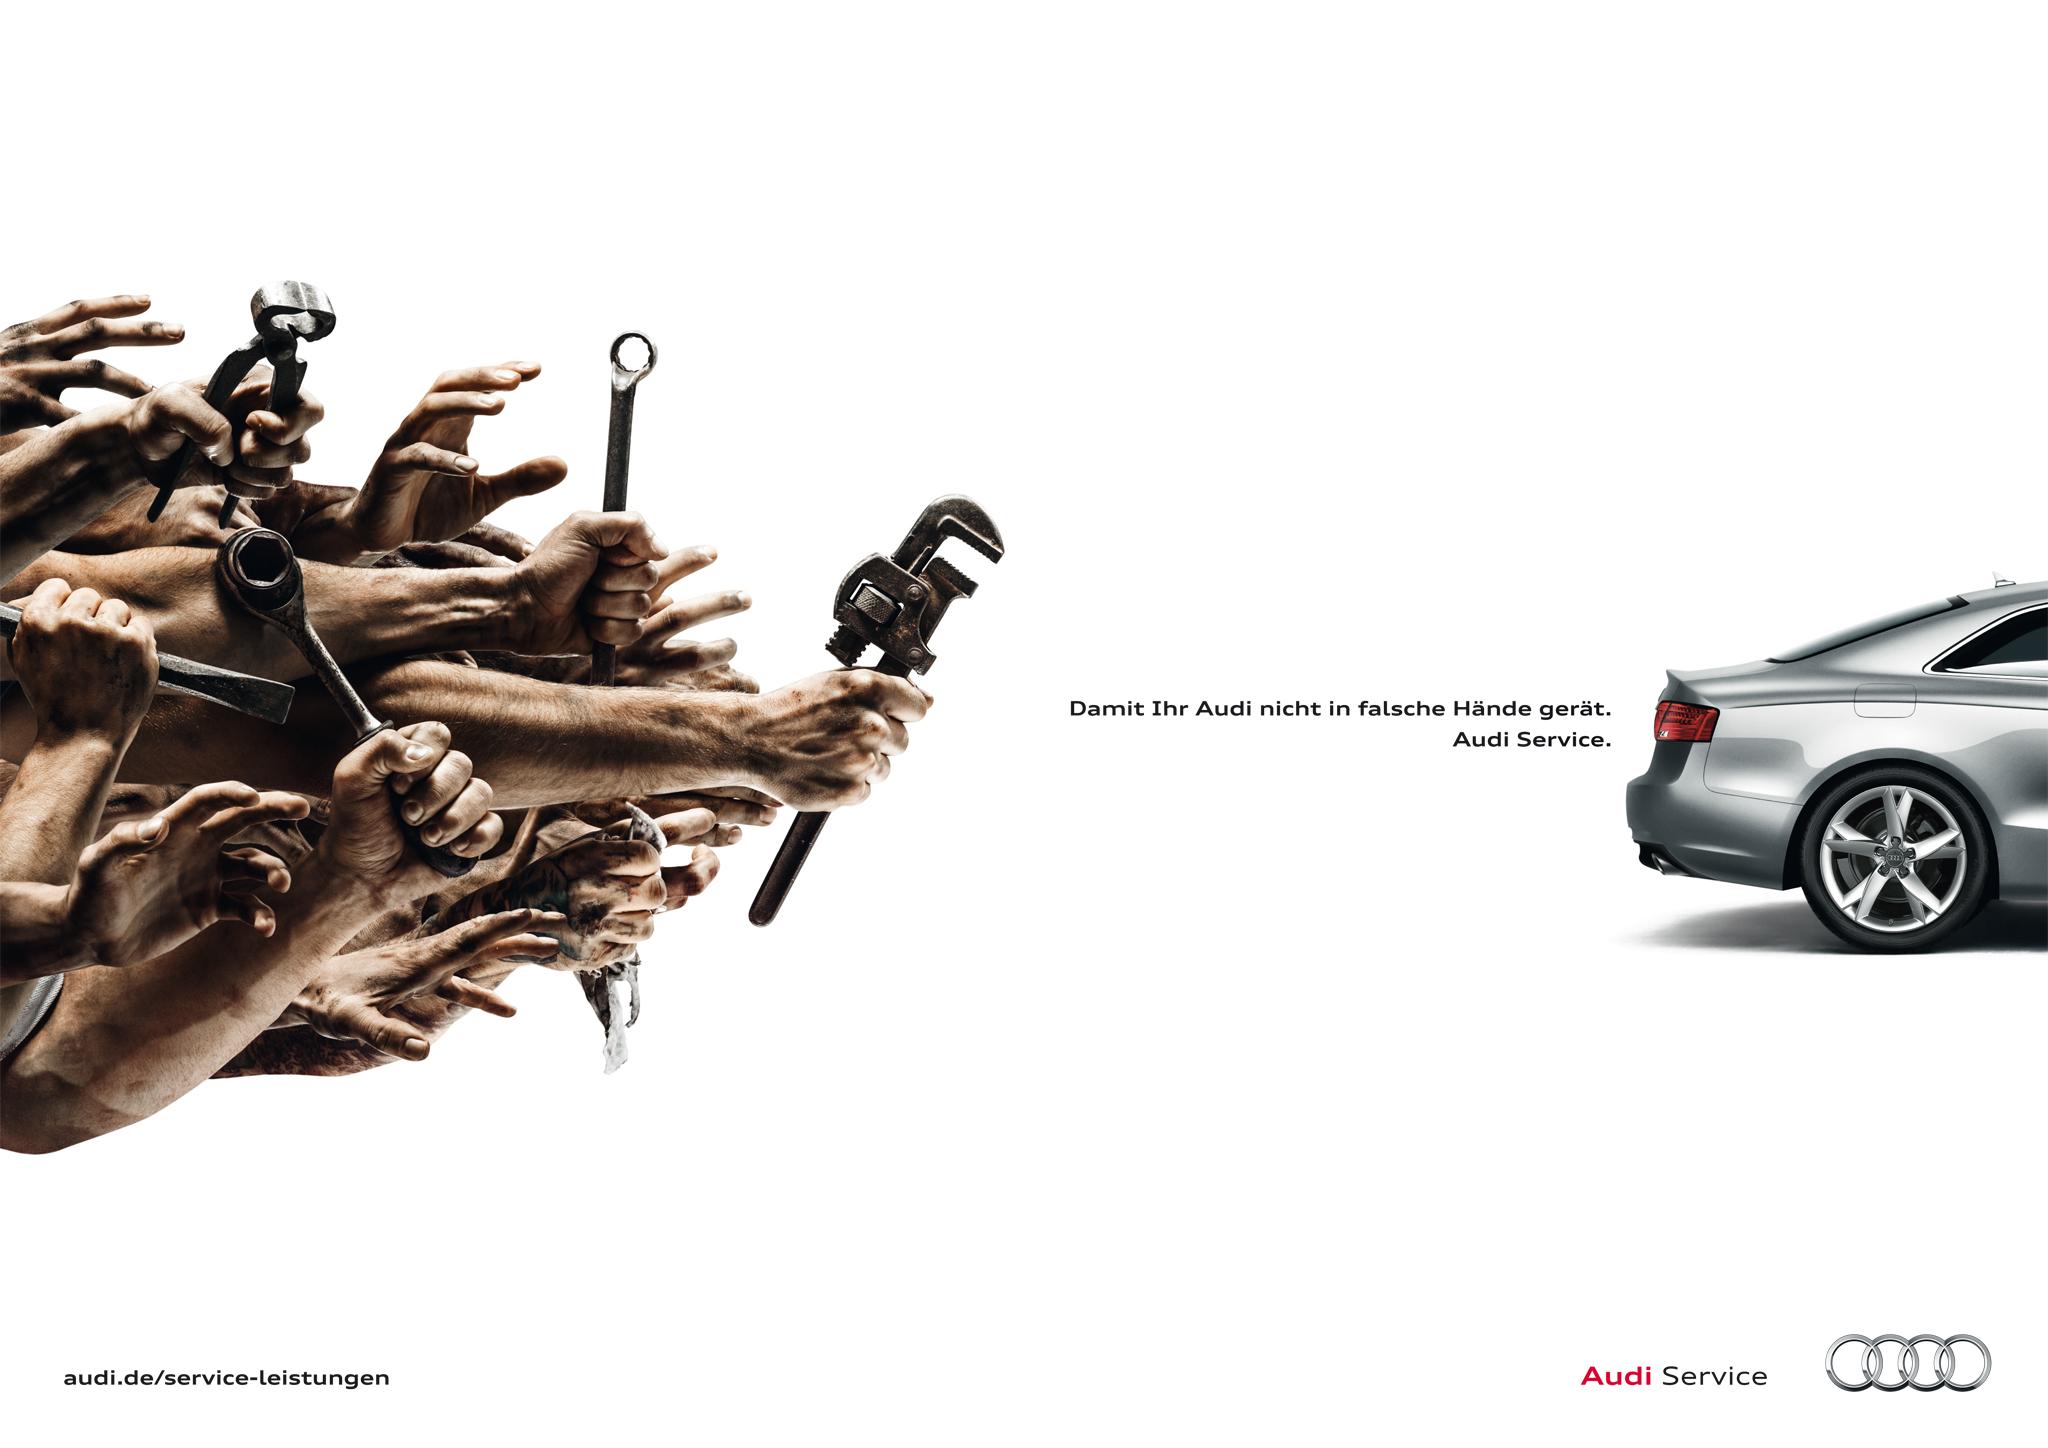 Audi Service | Photographer Attila Hartwig | Agency thjnk Berlin